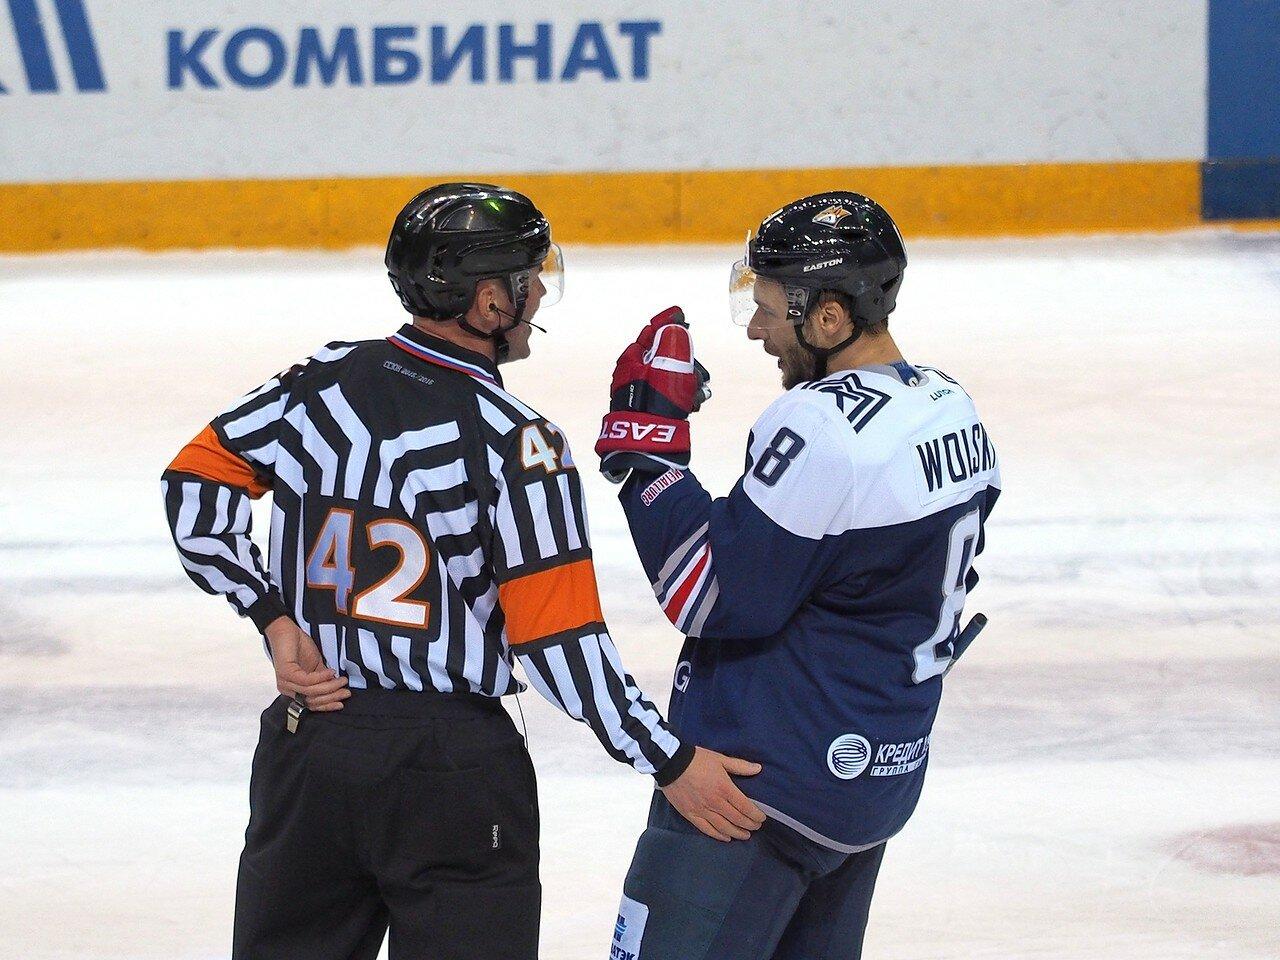 61Плей-офф 2016 Восток 1/2 Металлург - Сибирь 16.03.2016